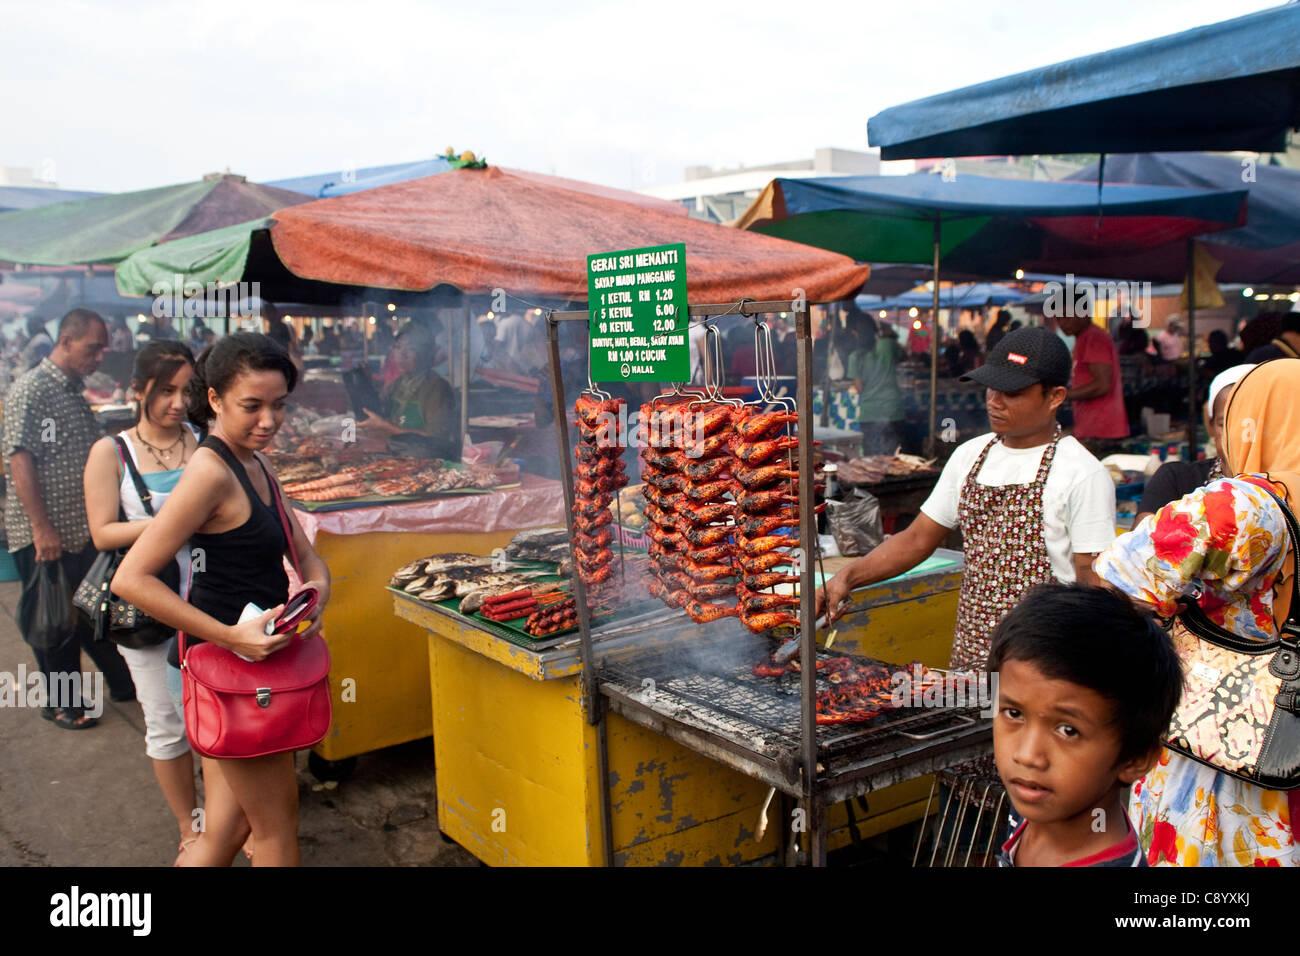 Stall in Philippines Market in Kota Kinabalu, Sabah, Borneo, Malaysia - Stock Image